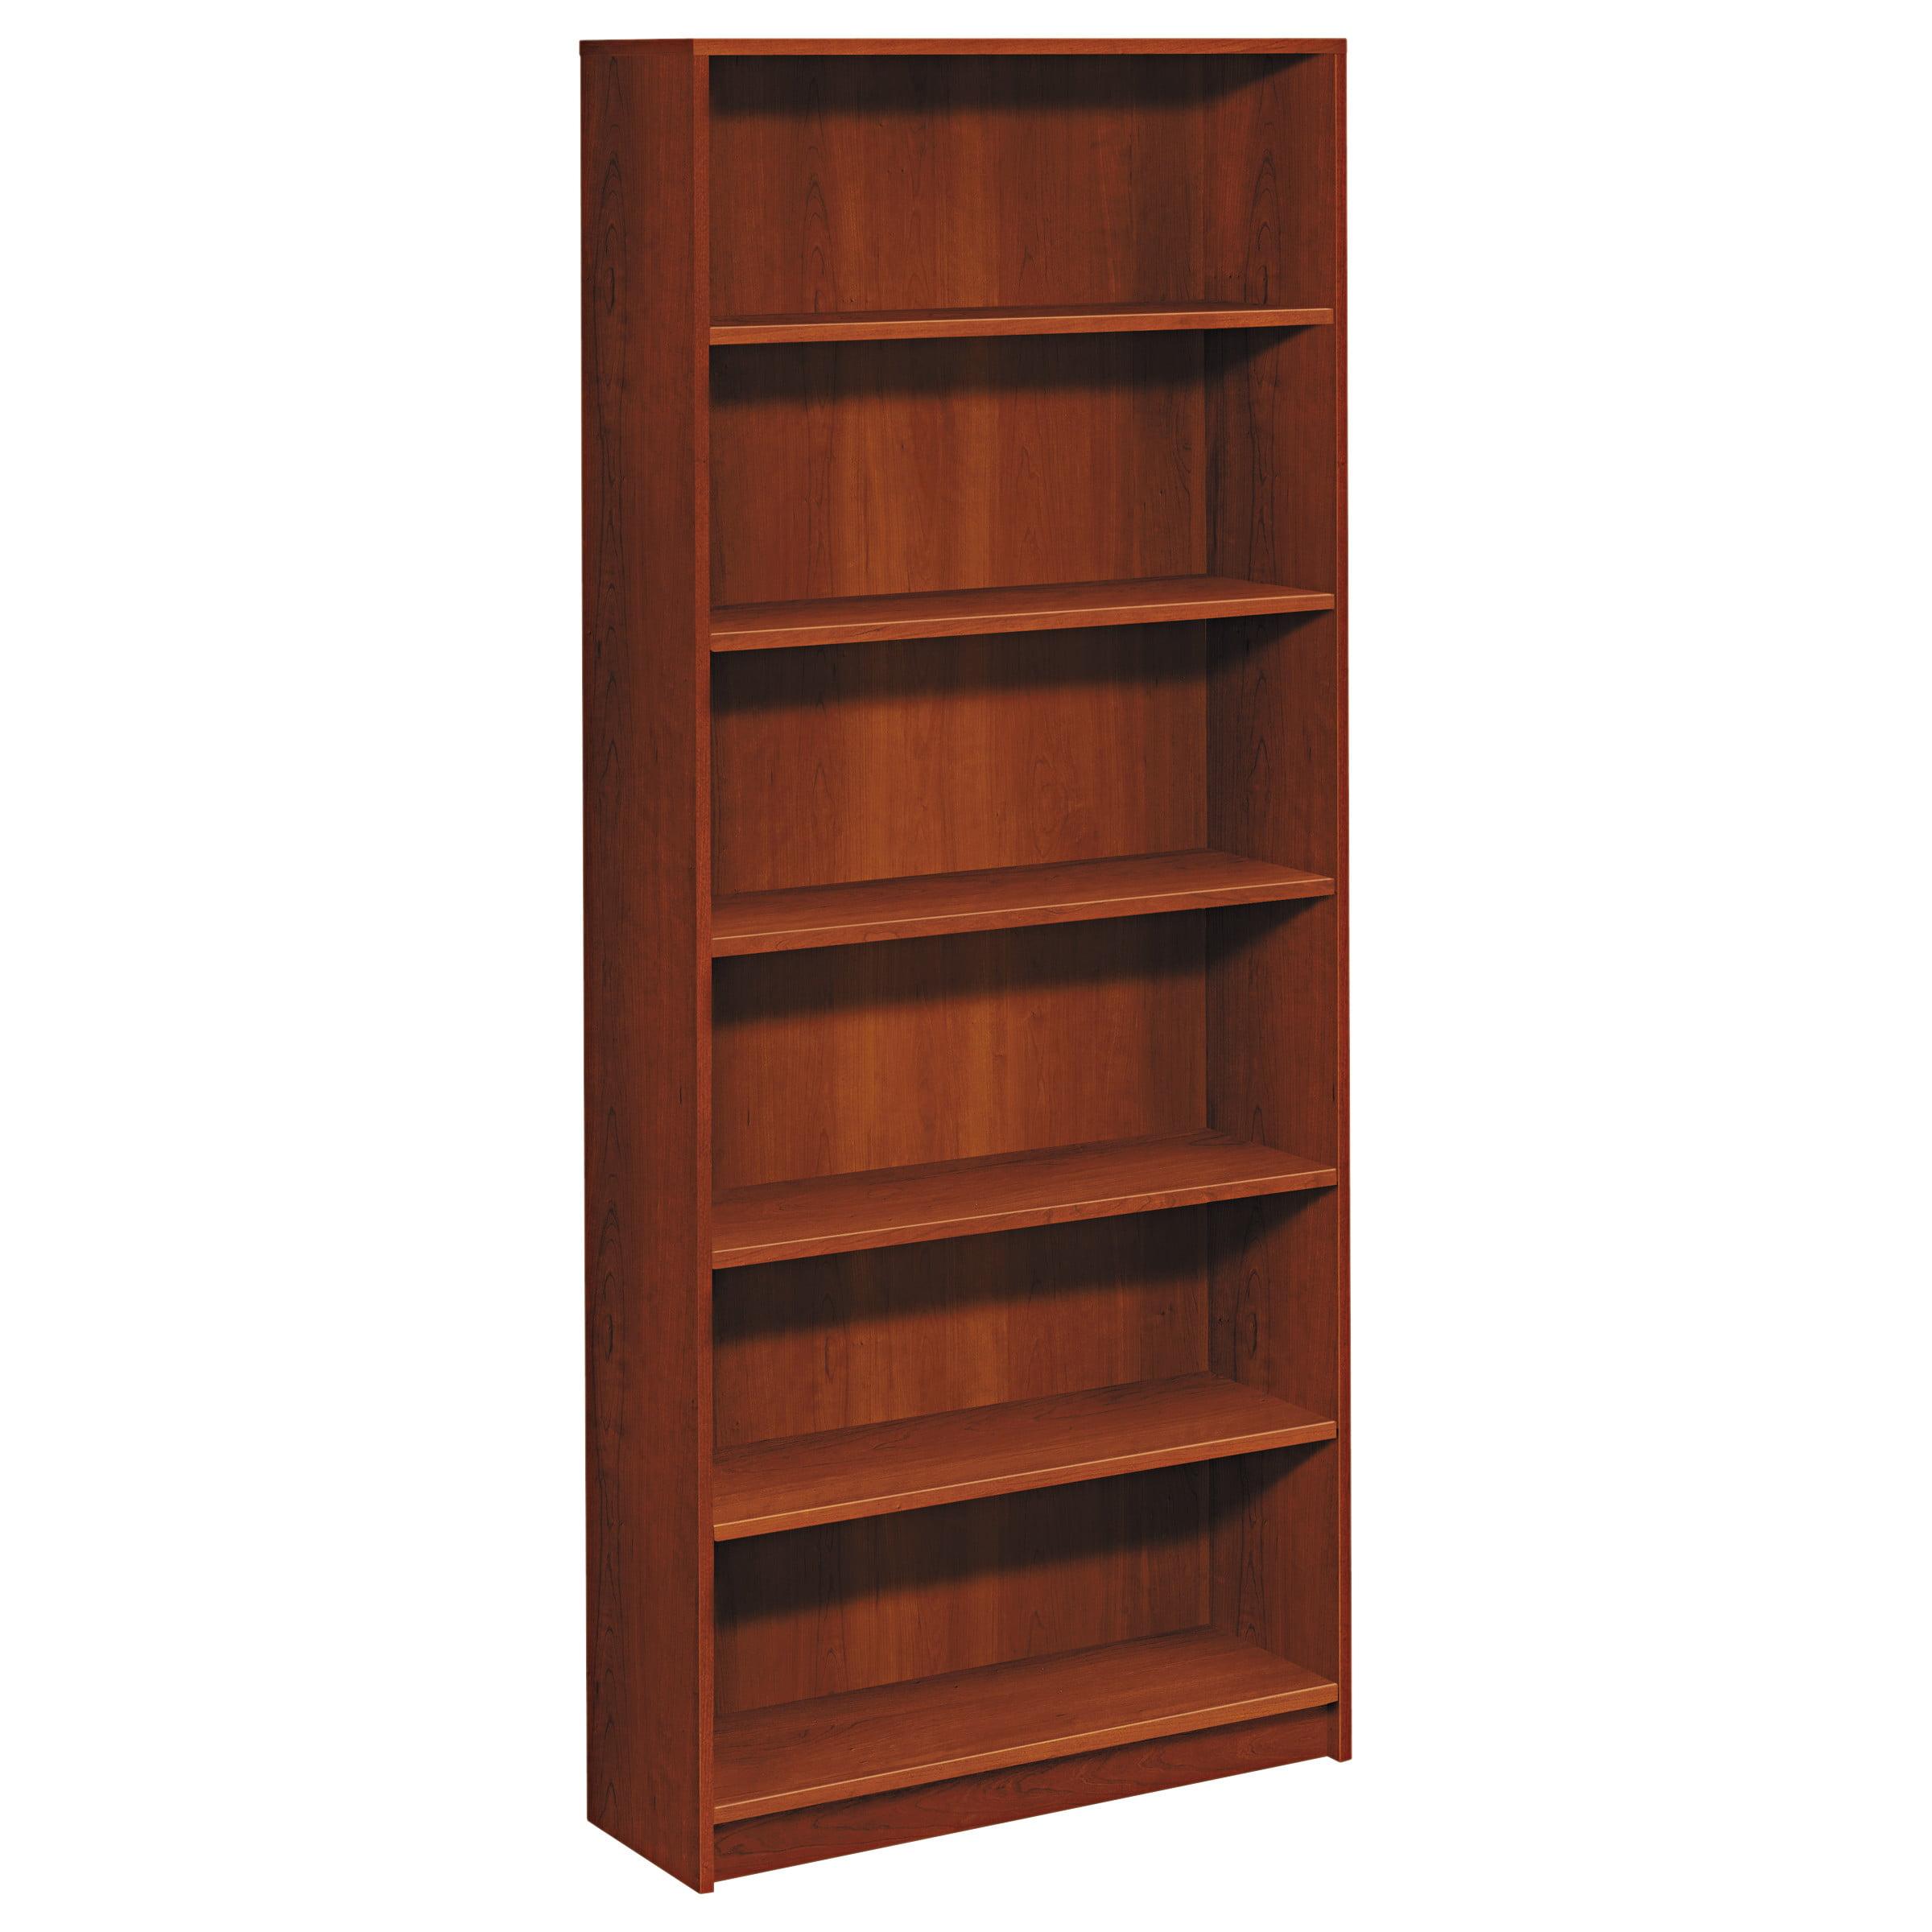 HON 1870 Series Bookcase, Six Shelf, 36w x 11 1/2d x 84h, Cognac